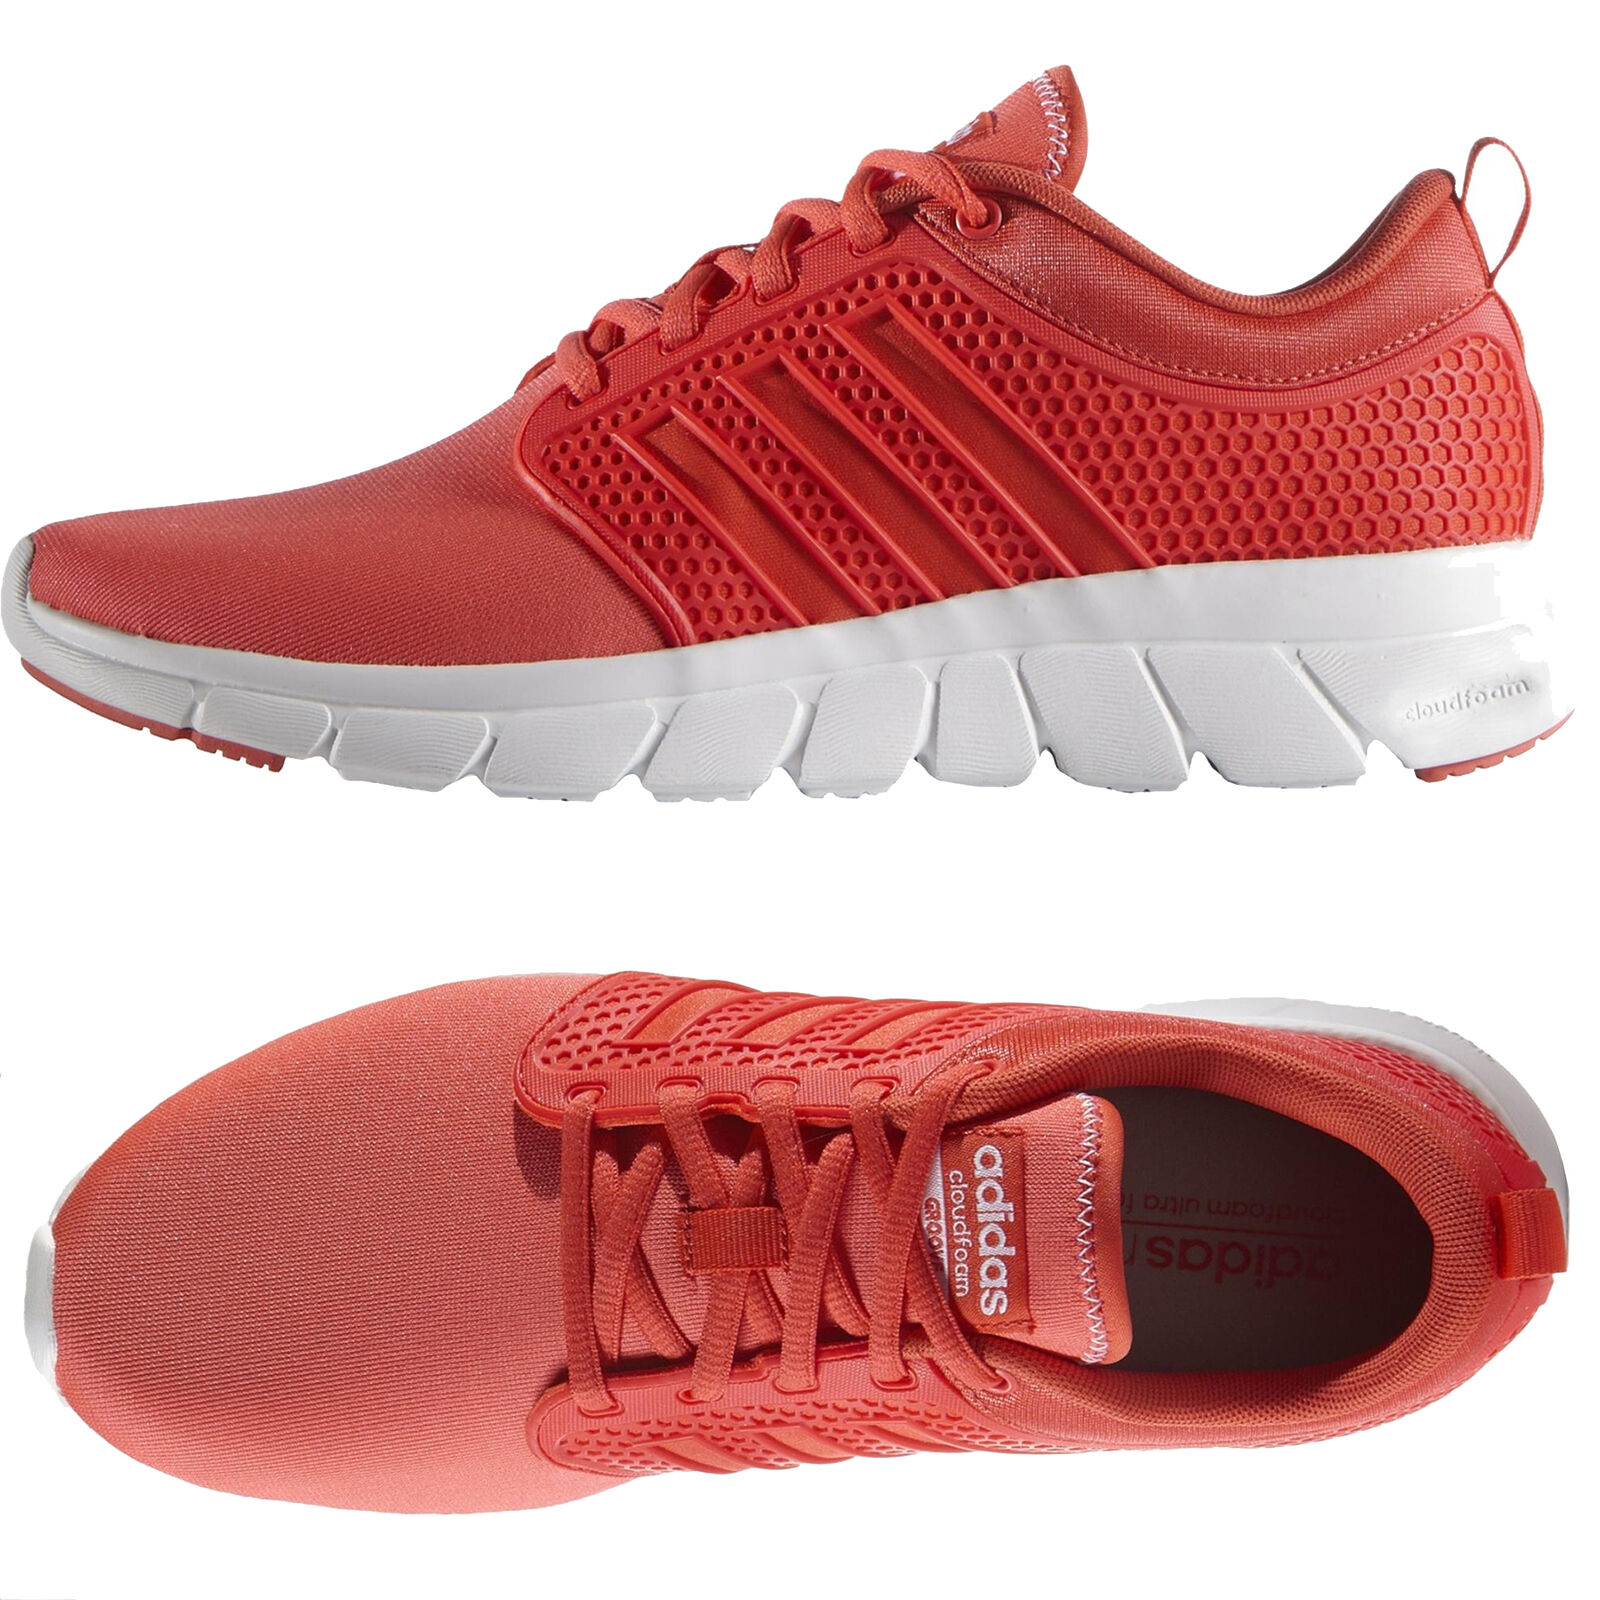 buy online b0007 0e4fa Adidas Cloudfoam Groove W Chaussures Femmes Chaussures De Course Sneaker  Sneaker Sneaker tailles au choix NEUF 8bd4c3